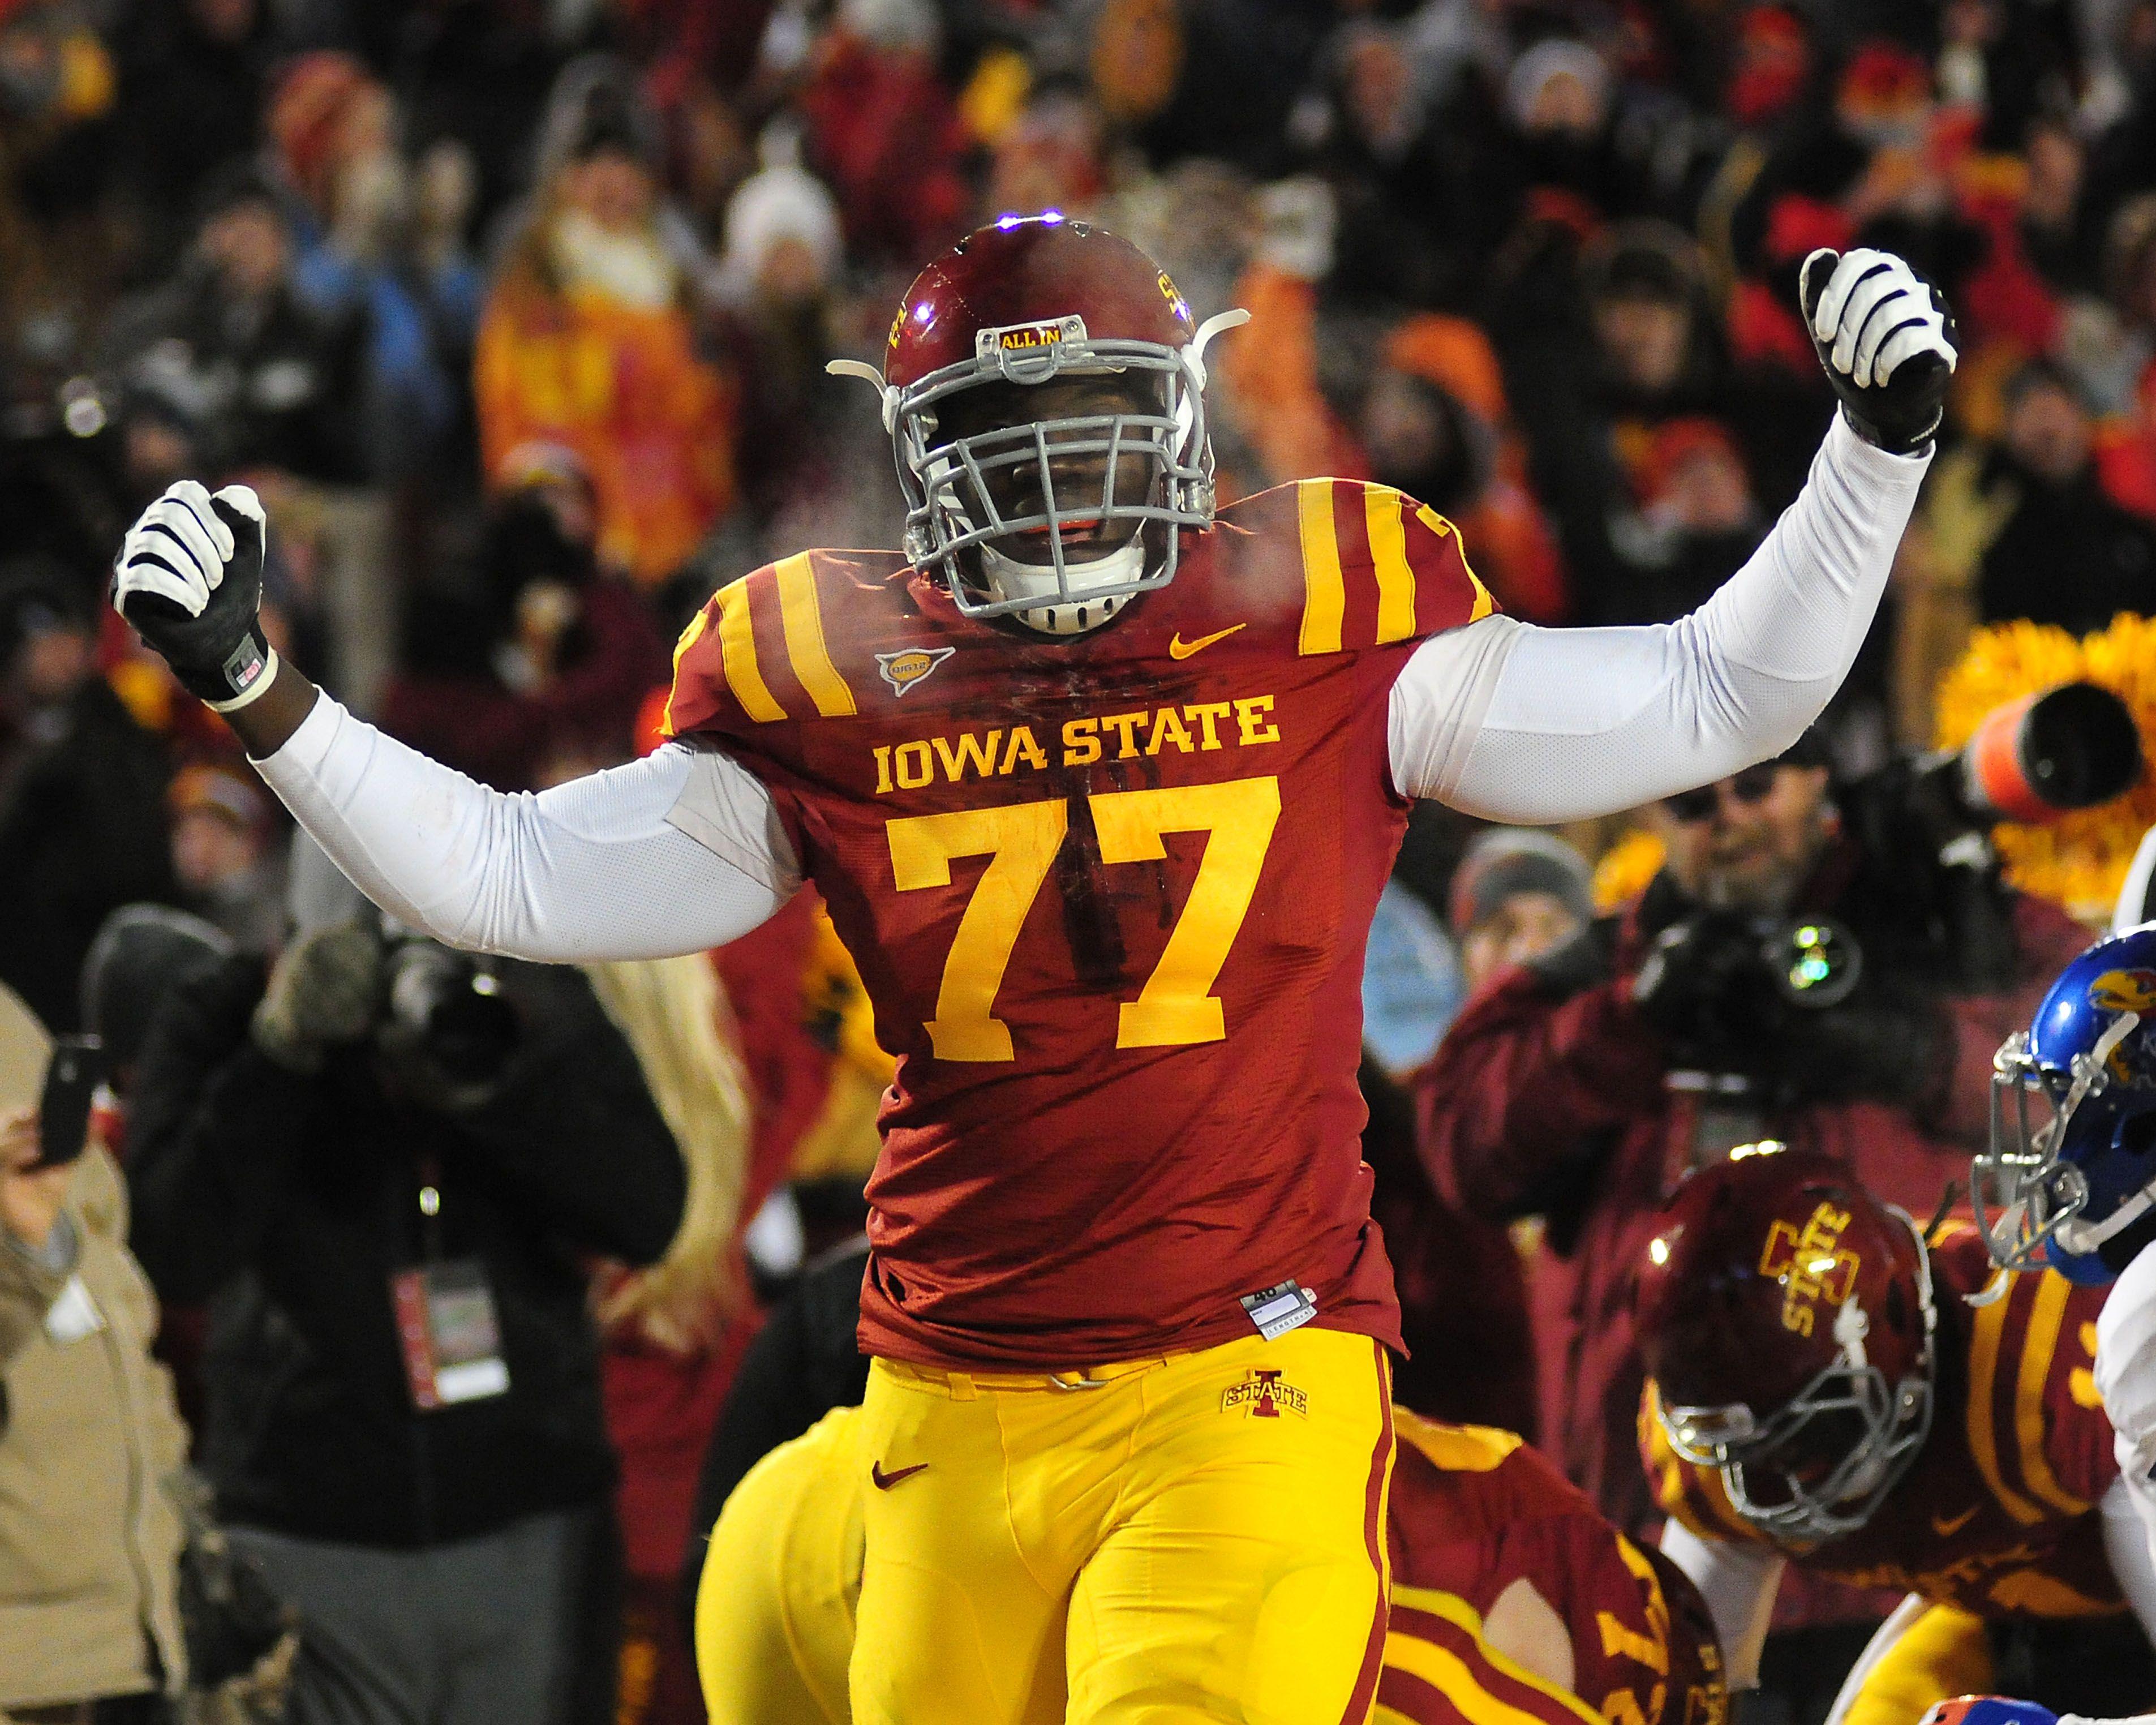 Iowa State Offensive Lineman Oni Omoile Celebrates A Tackle